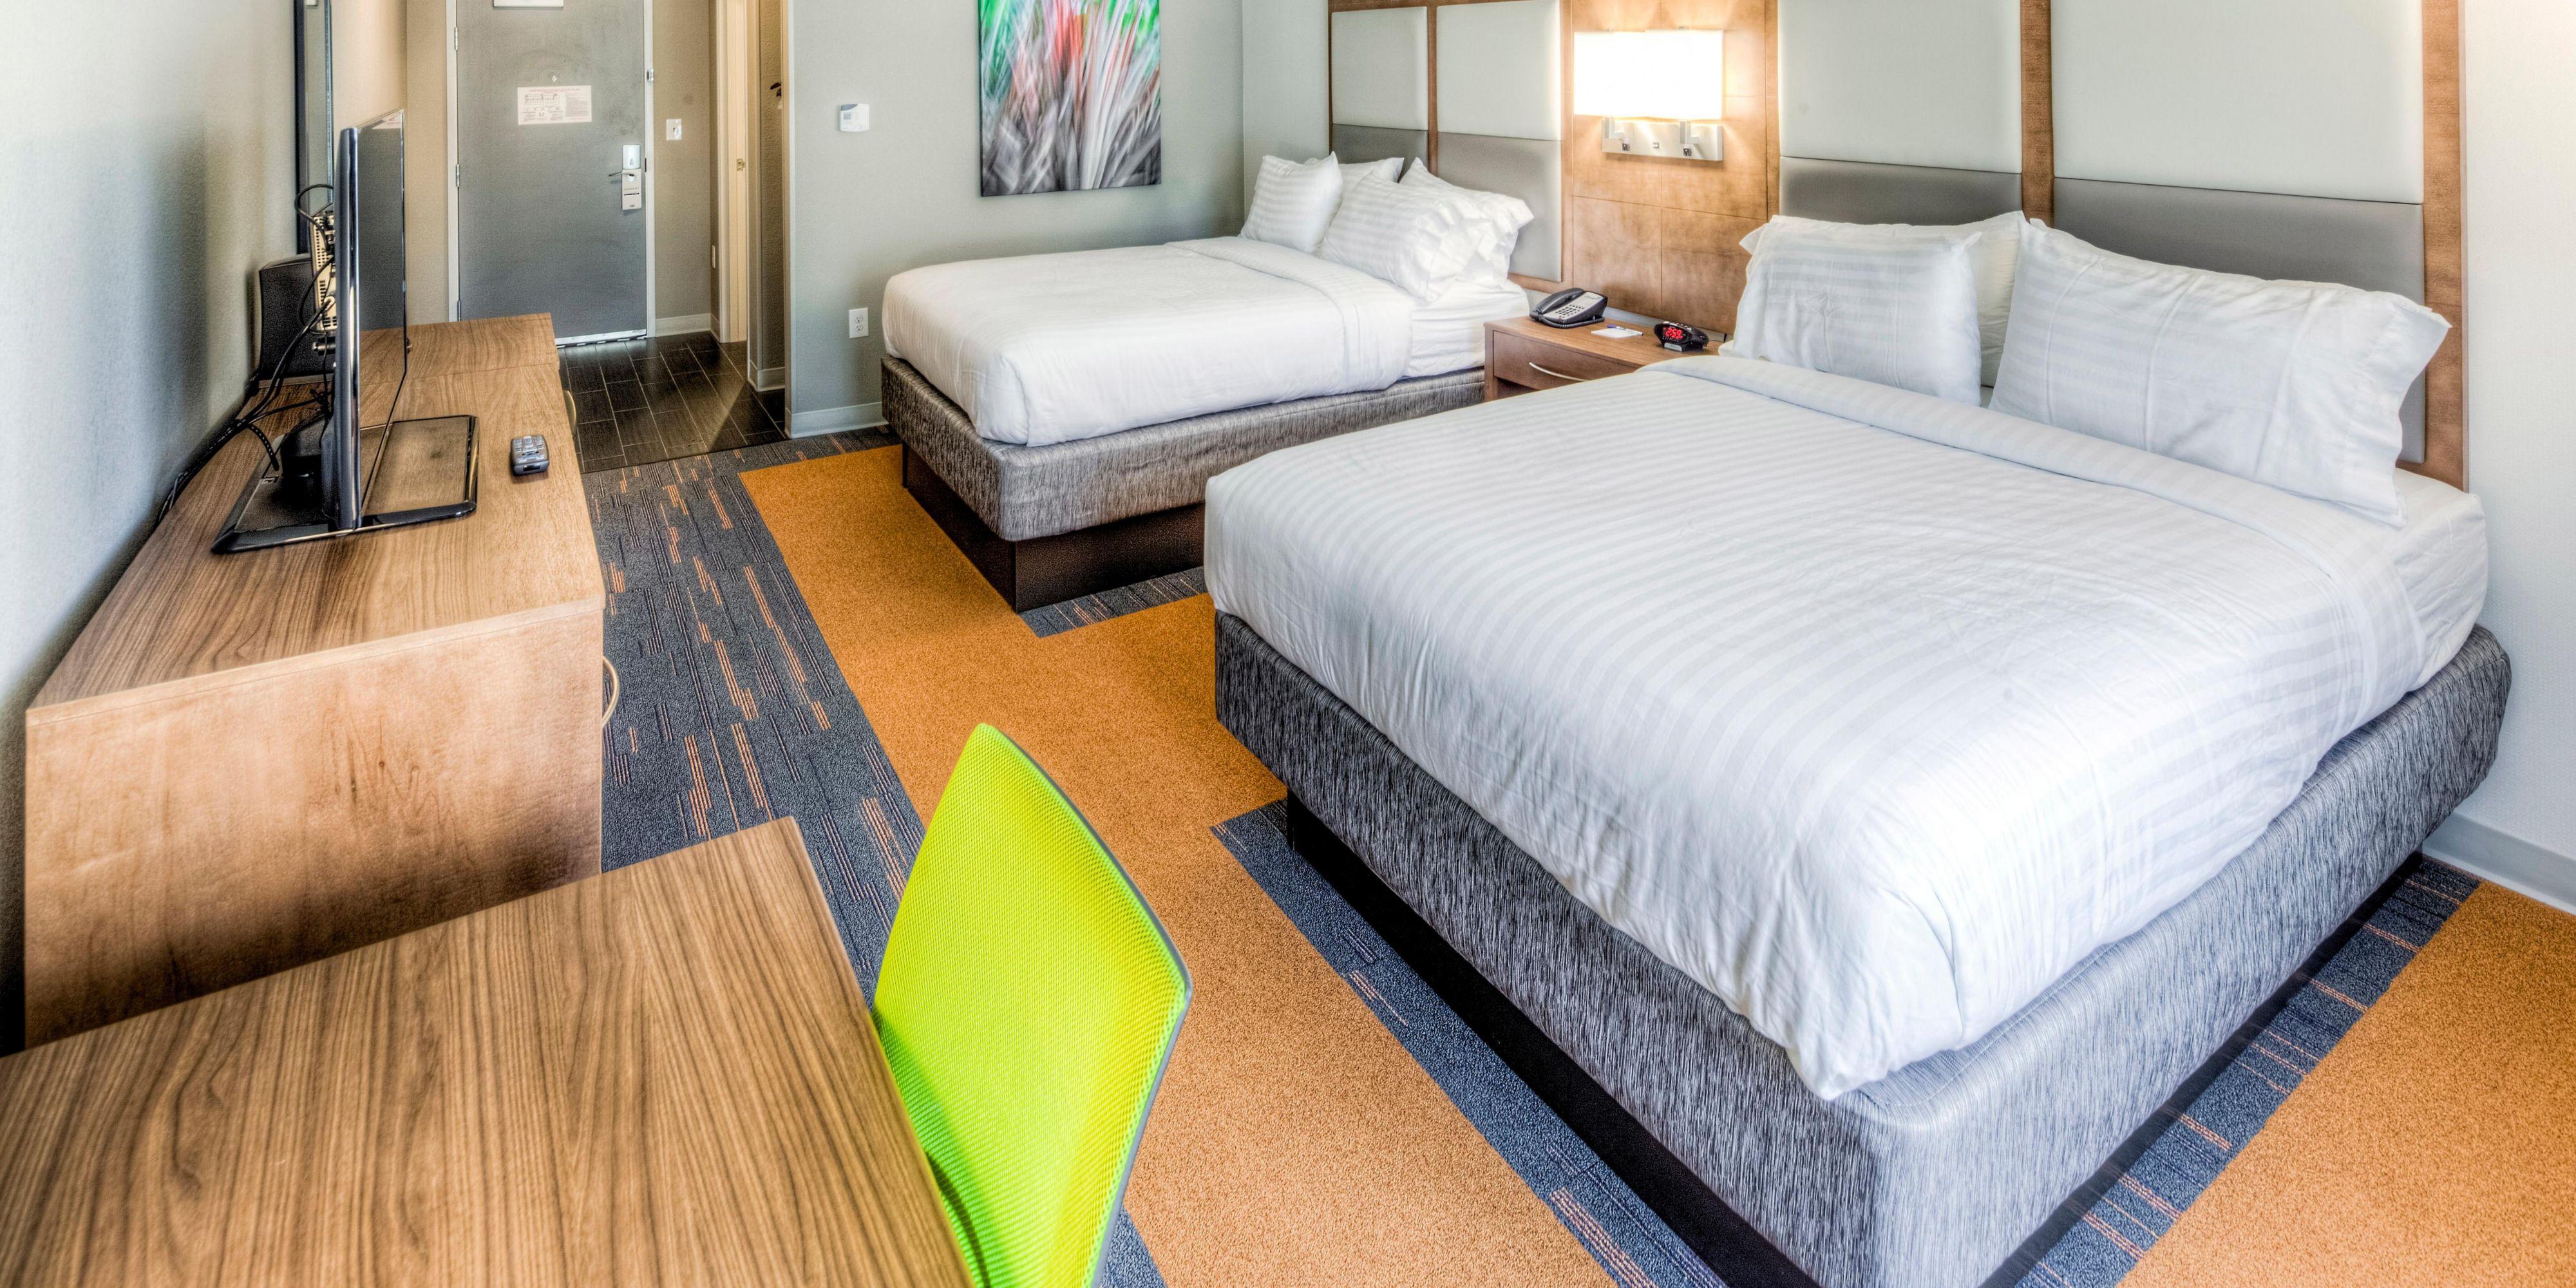 Holiday Inn Express & Suites Cleveland West - Westlake Hotel